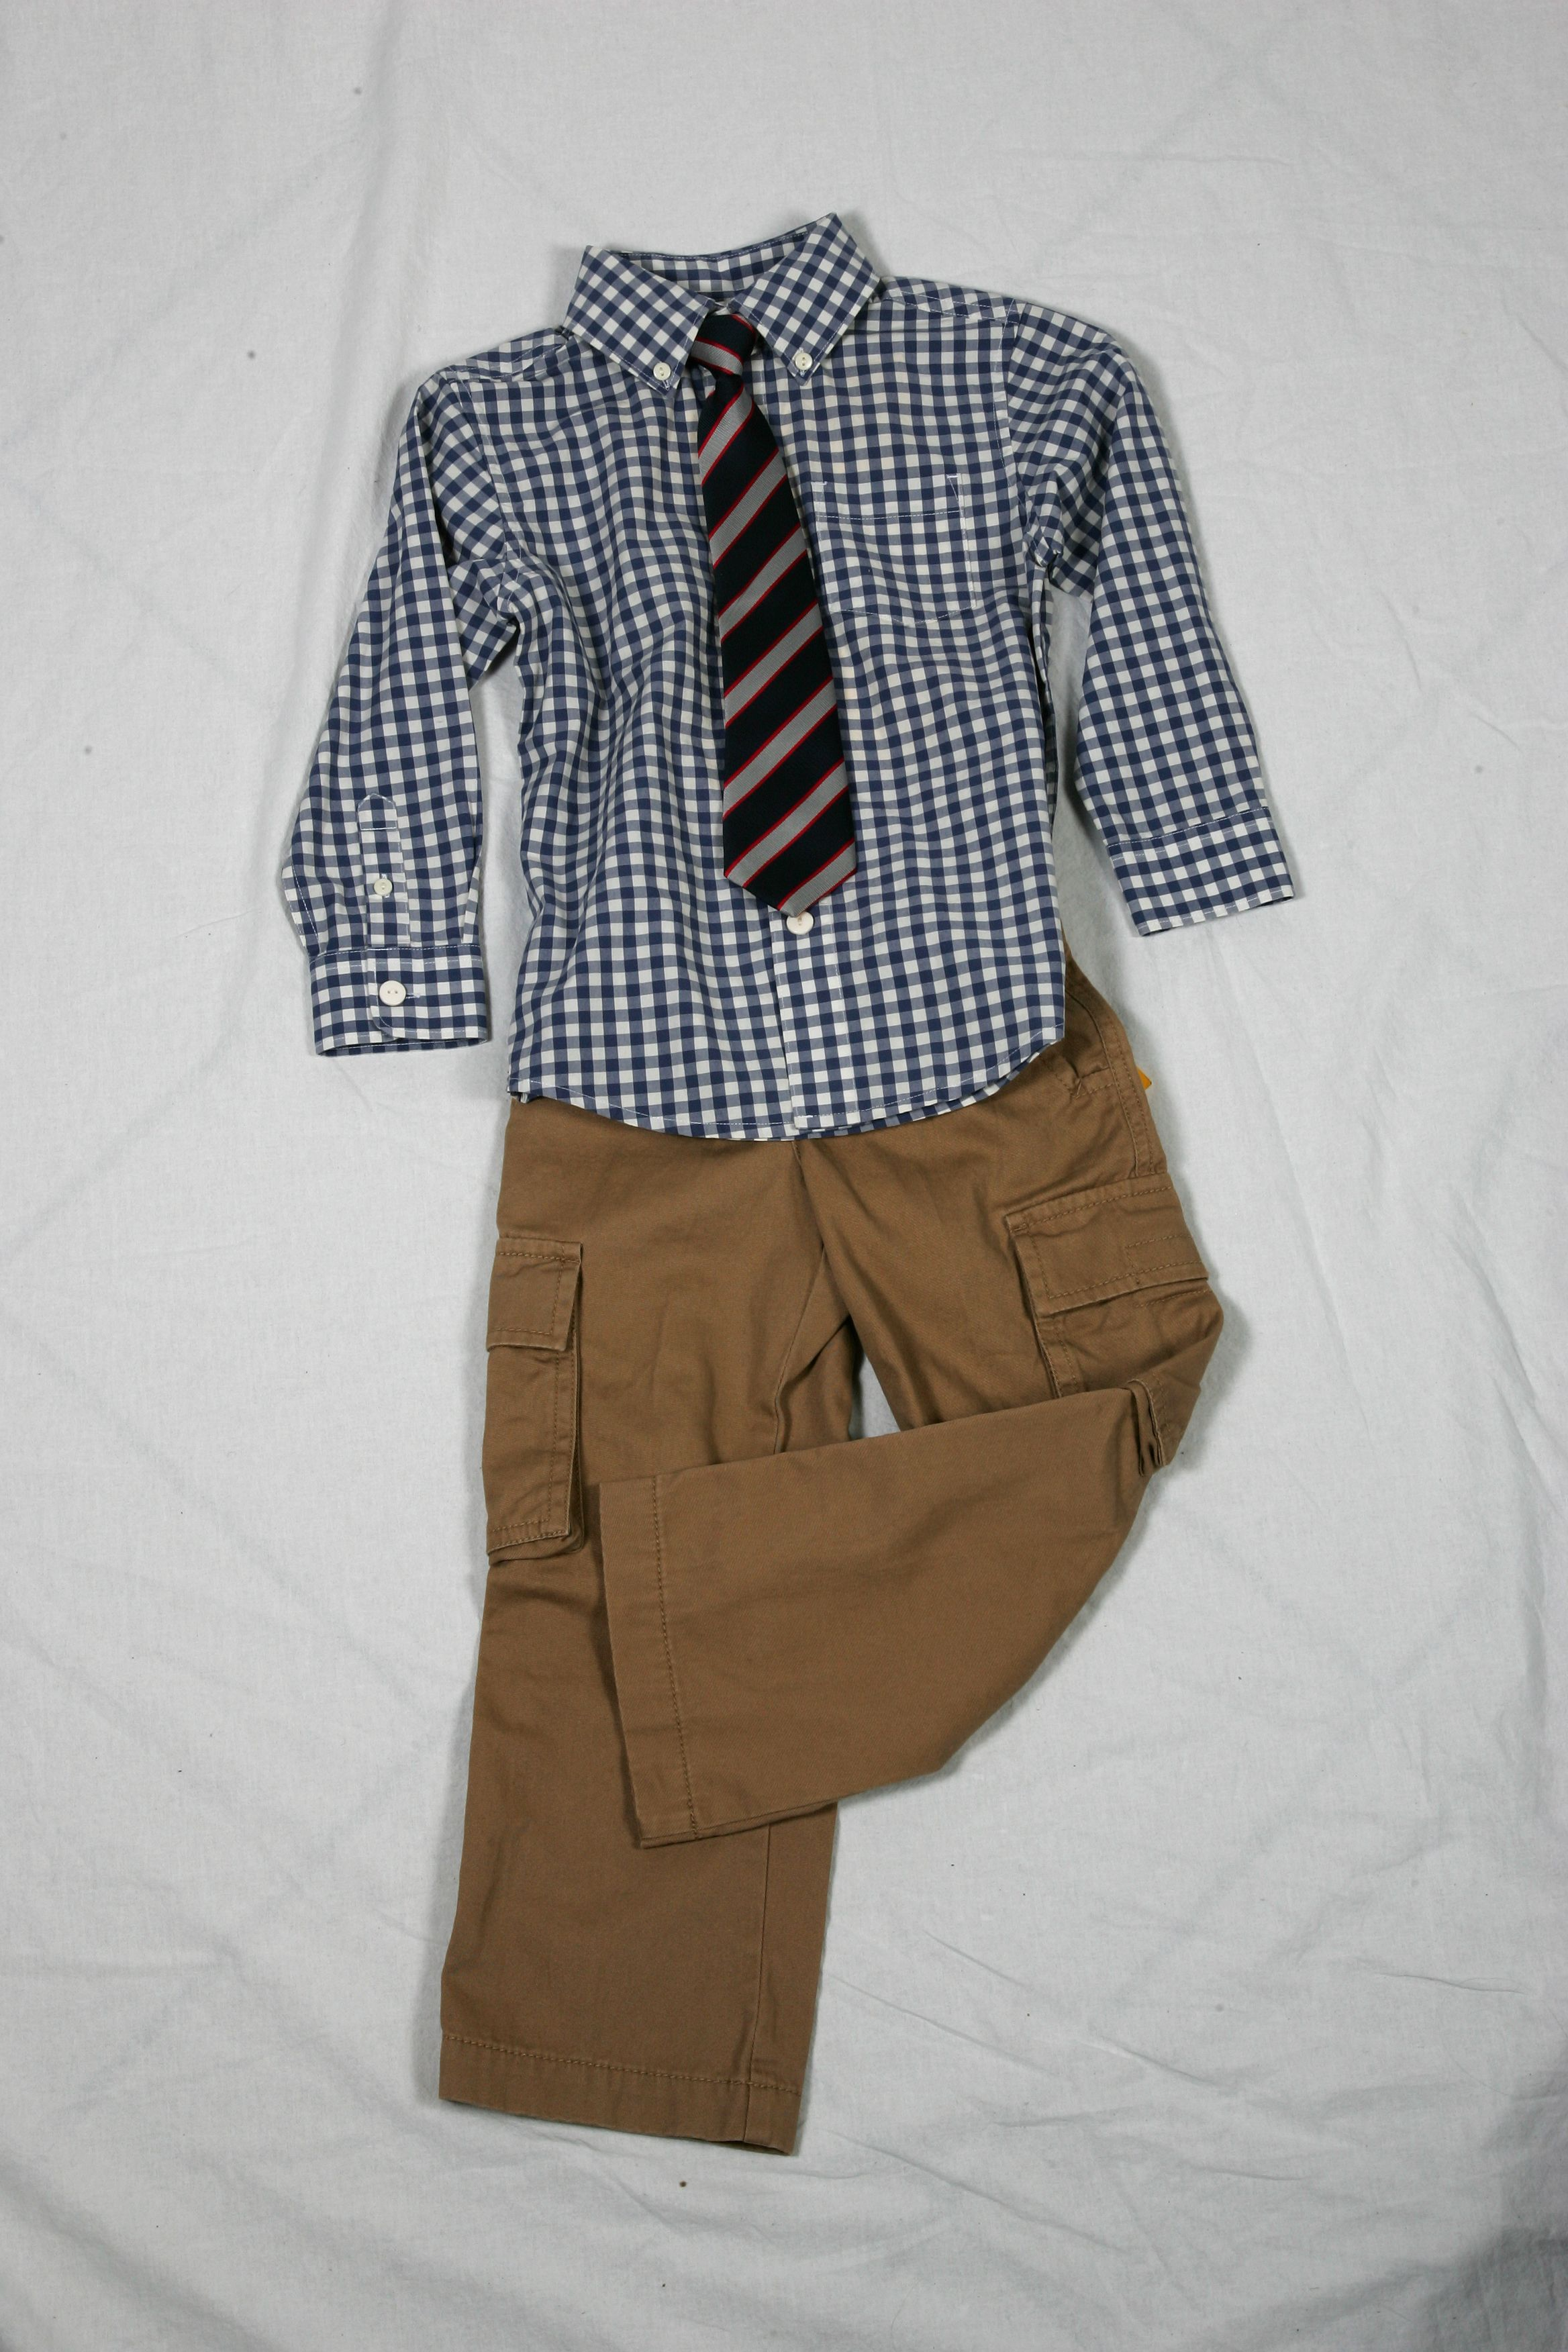 Khaki Cargo Pants Blue Check Button Up Shirt